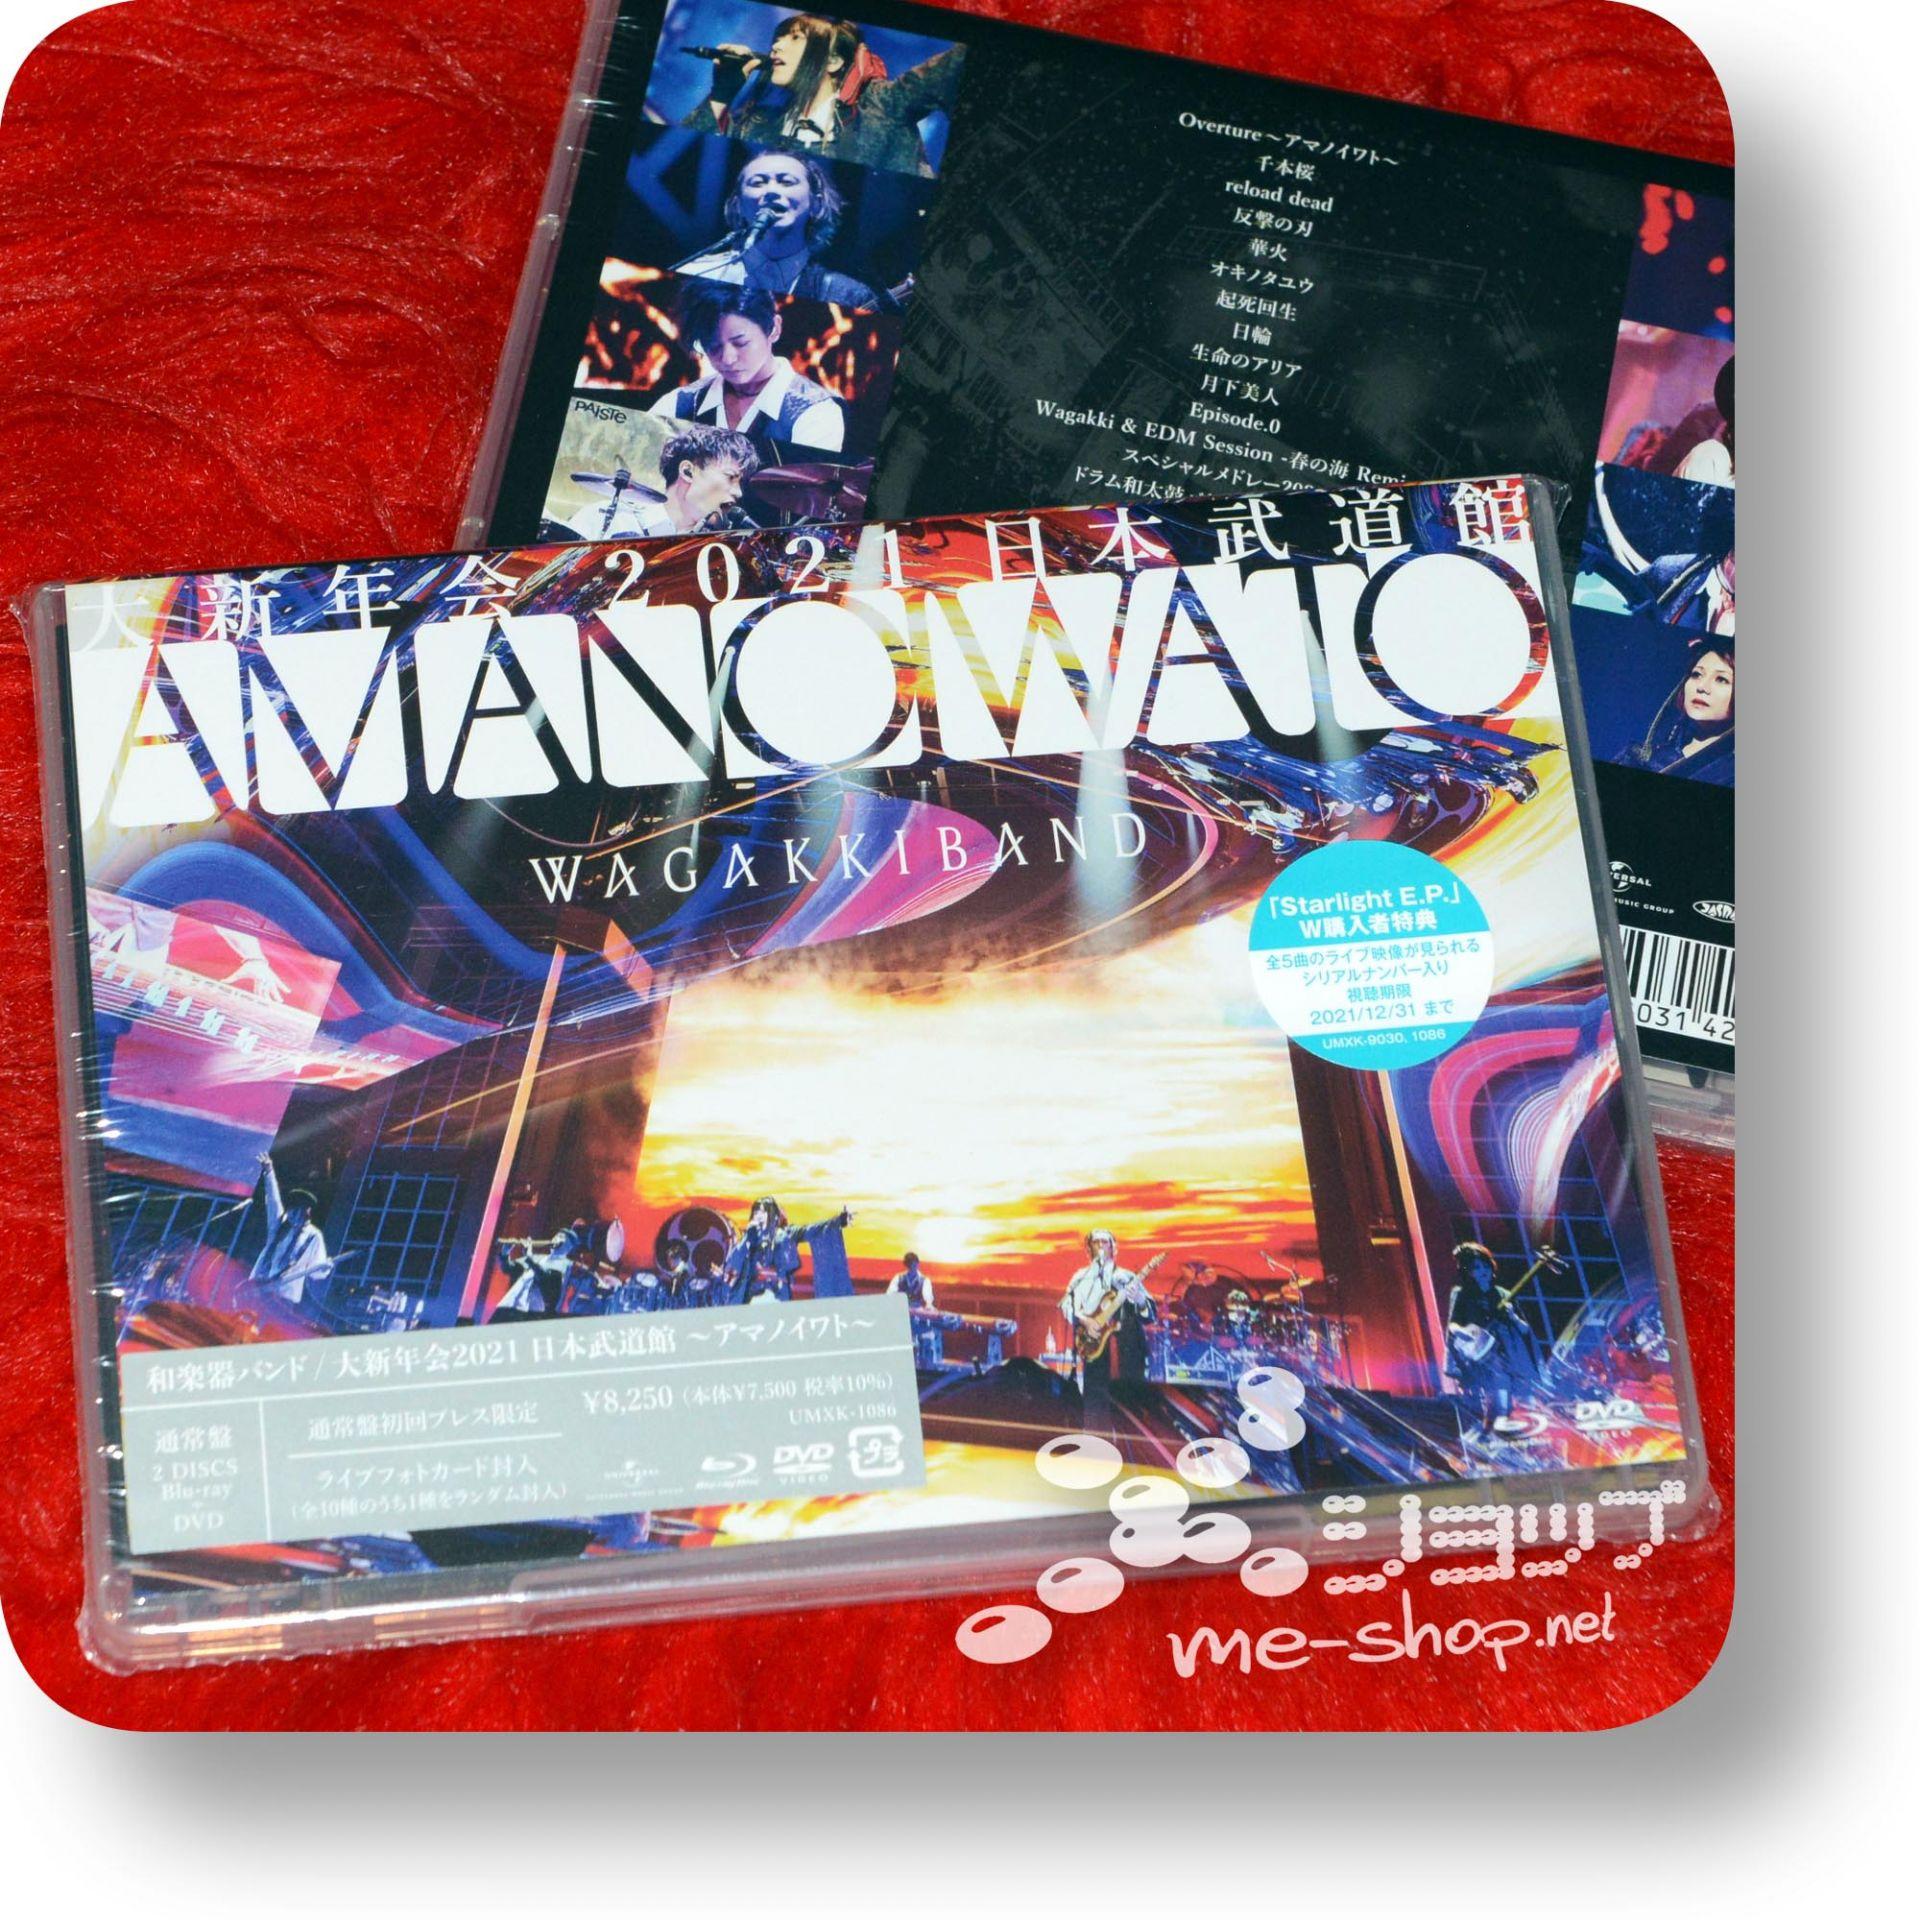 wagakki band amanoiwato bd